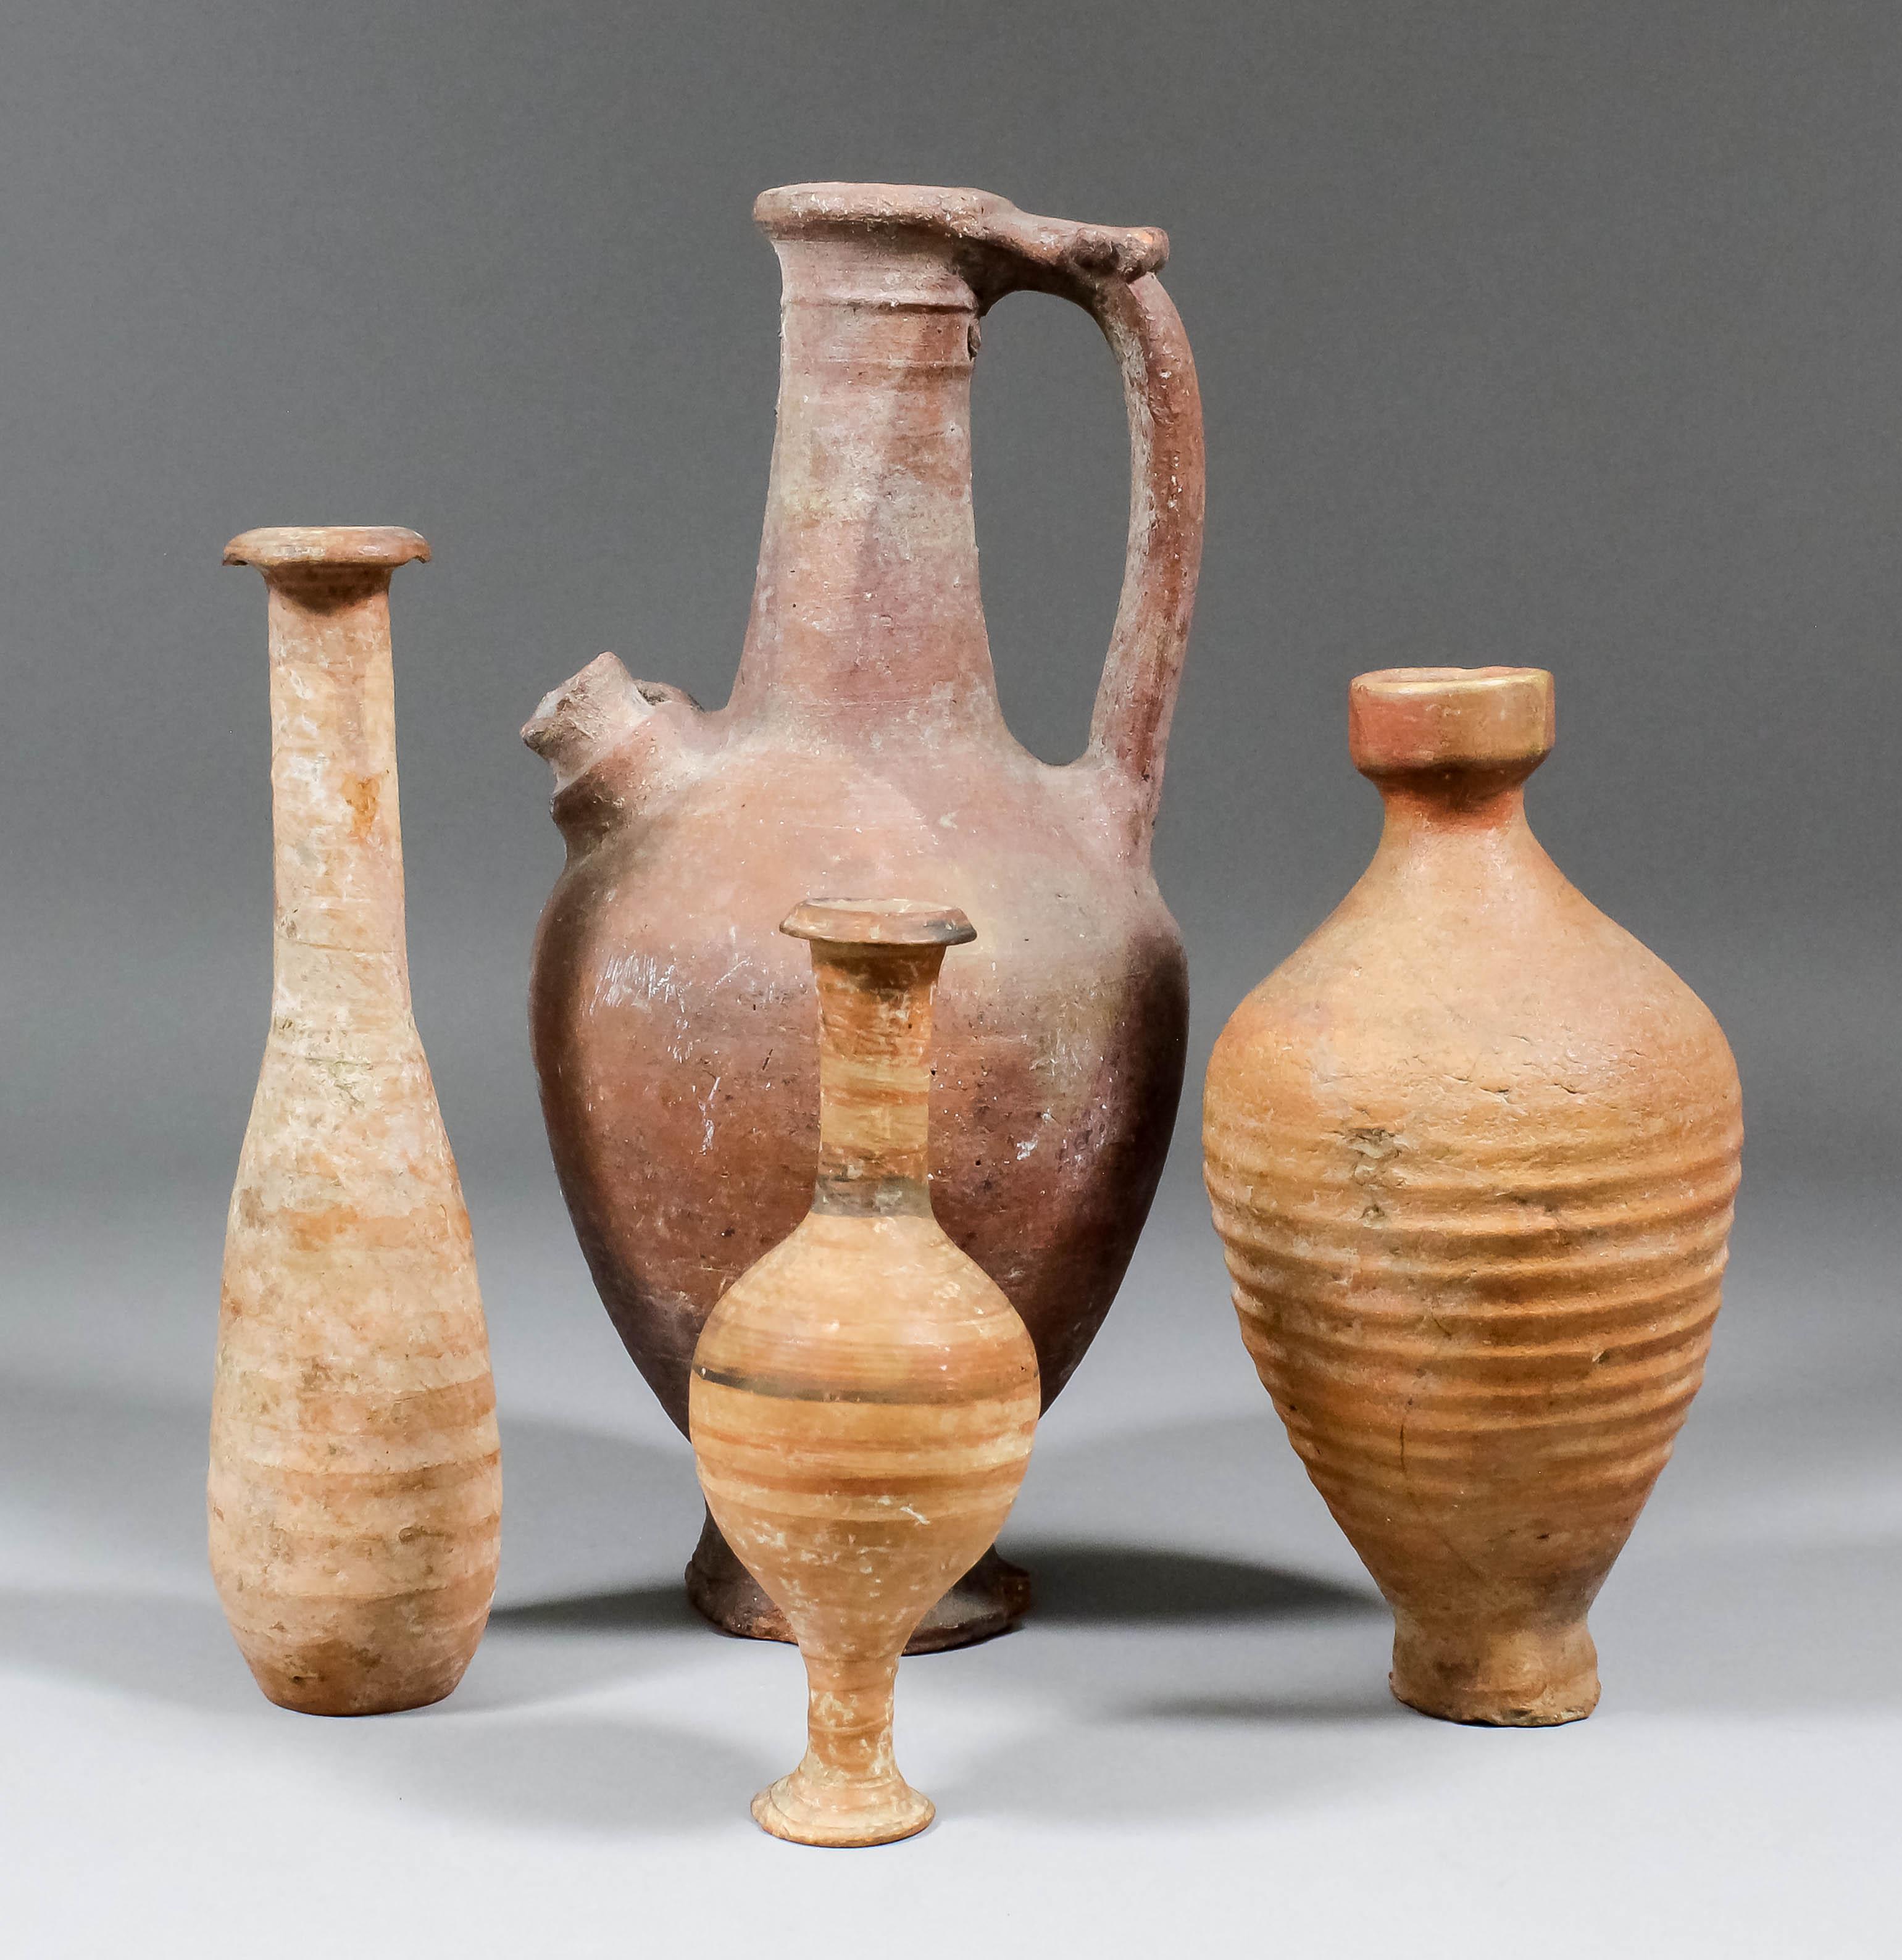 A roman pottery unquentarium 825ins high a small pottery vase lot 452 a roman pottery unquentarium 825ins high a small pottery vase reviewsmspy